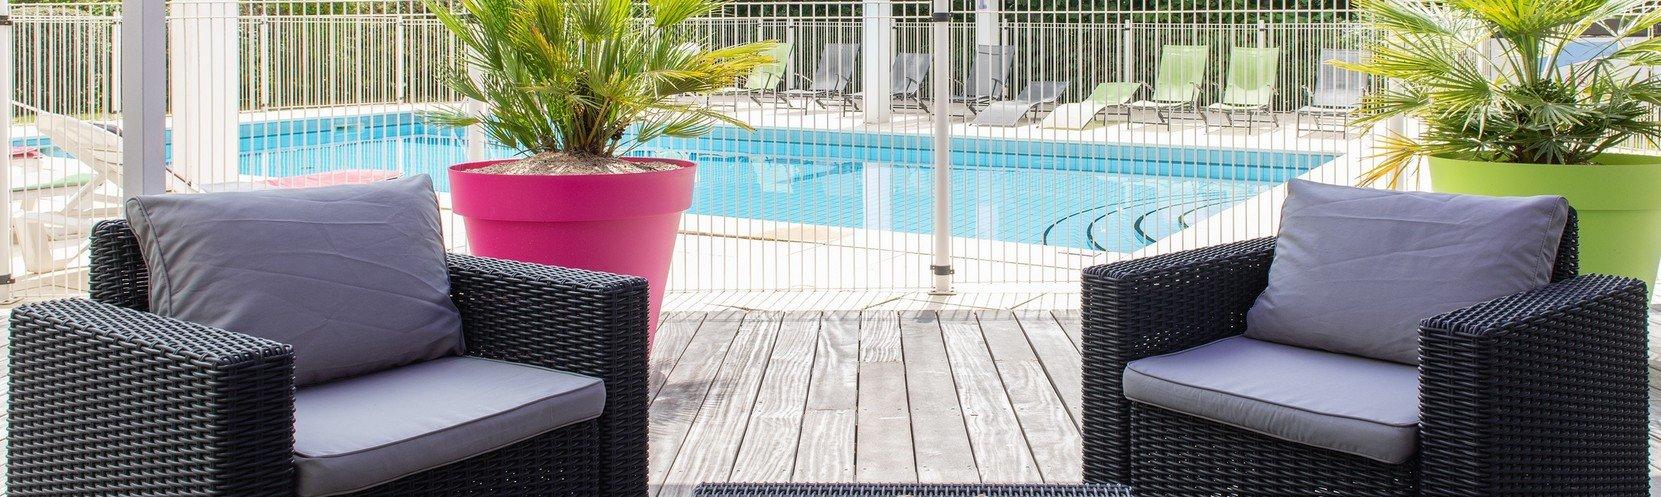 residence-cerise-dax-les-jardins-du-lac-piscine.jpg